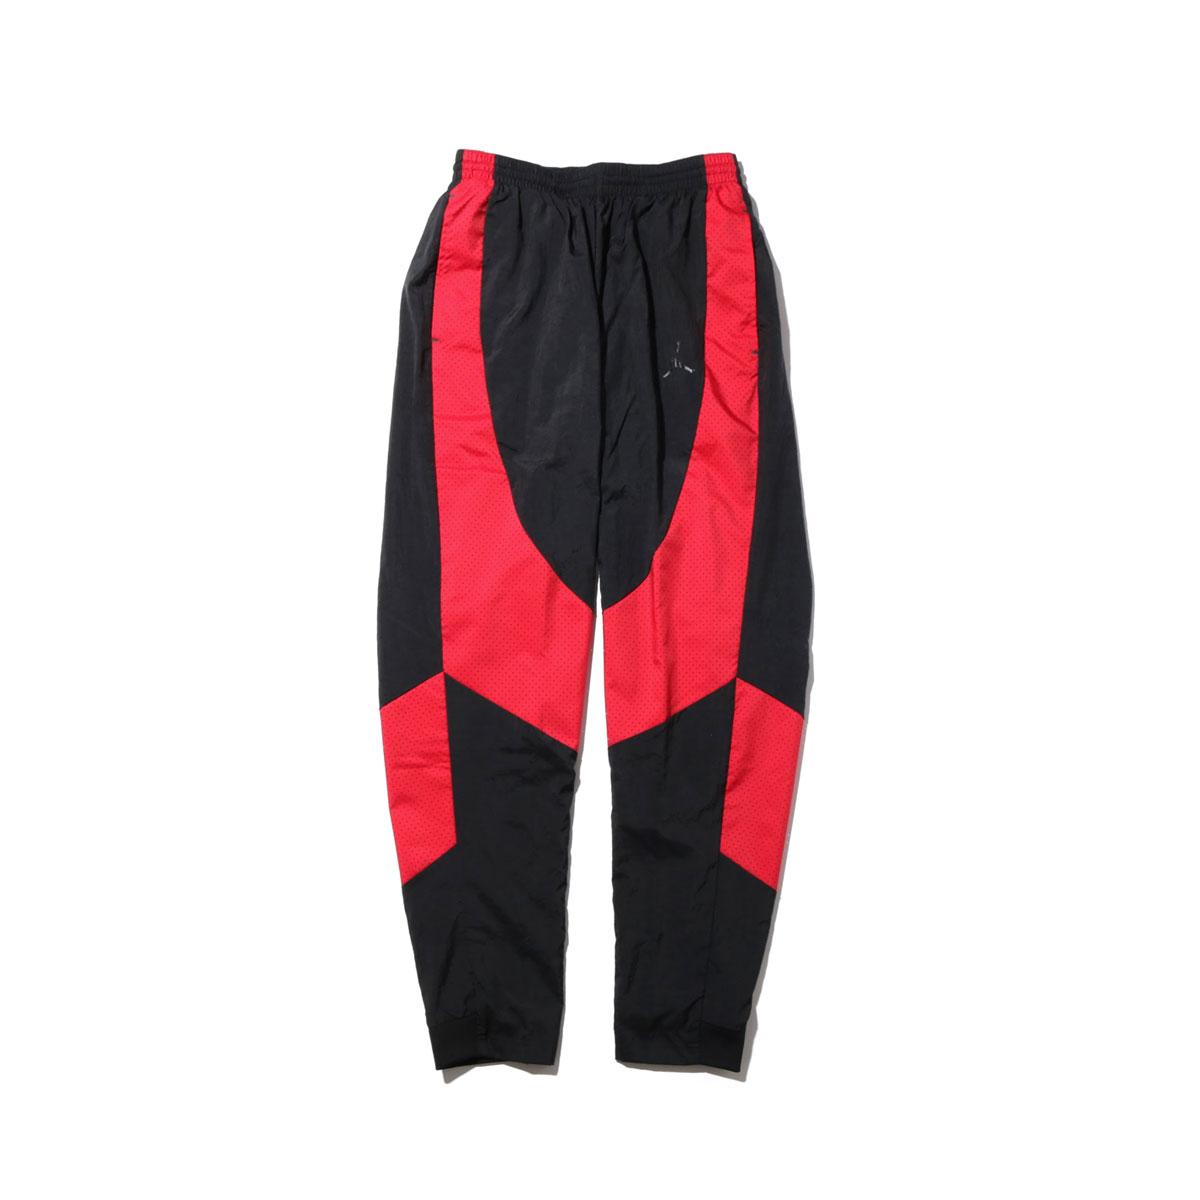 NIKE JSW WINGS MUSCLE PANT(ナイキ ジョーダン JSW WINGS マッスル パンツ)(BLACK/GYM RED/(BLACK))【メンズ】17HO-S